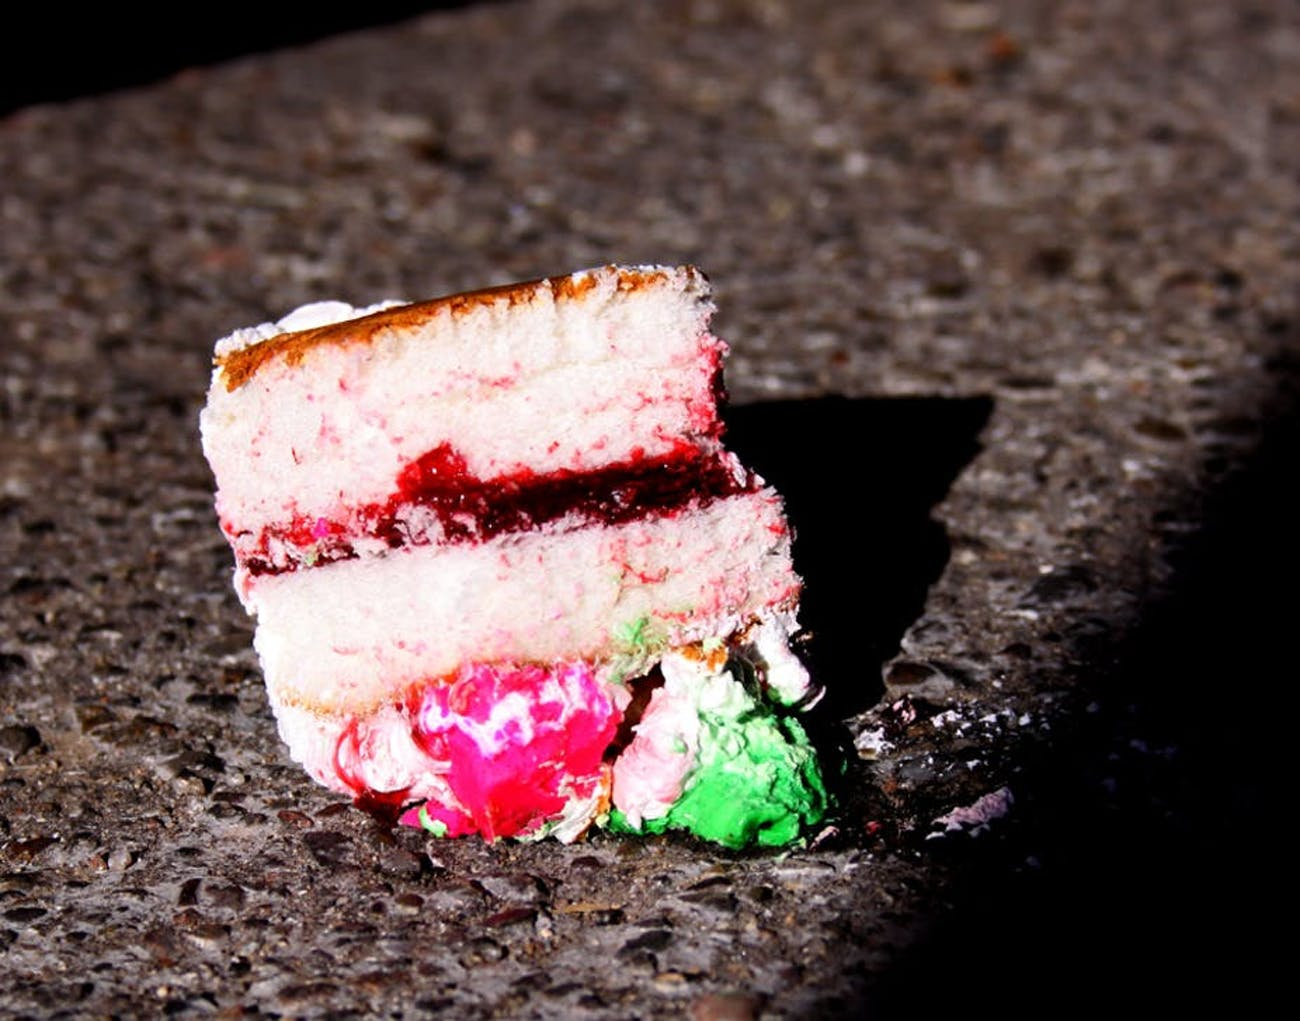 Cake on the ground